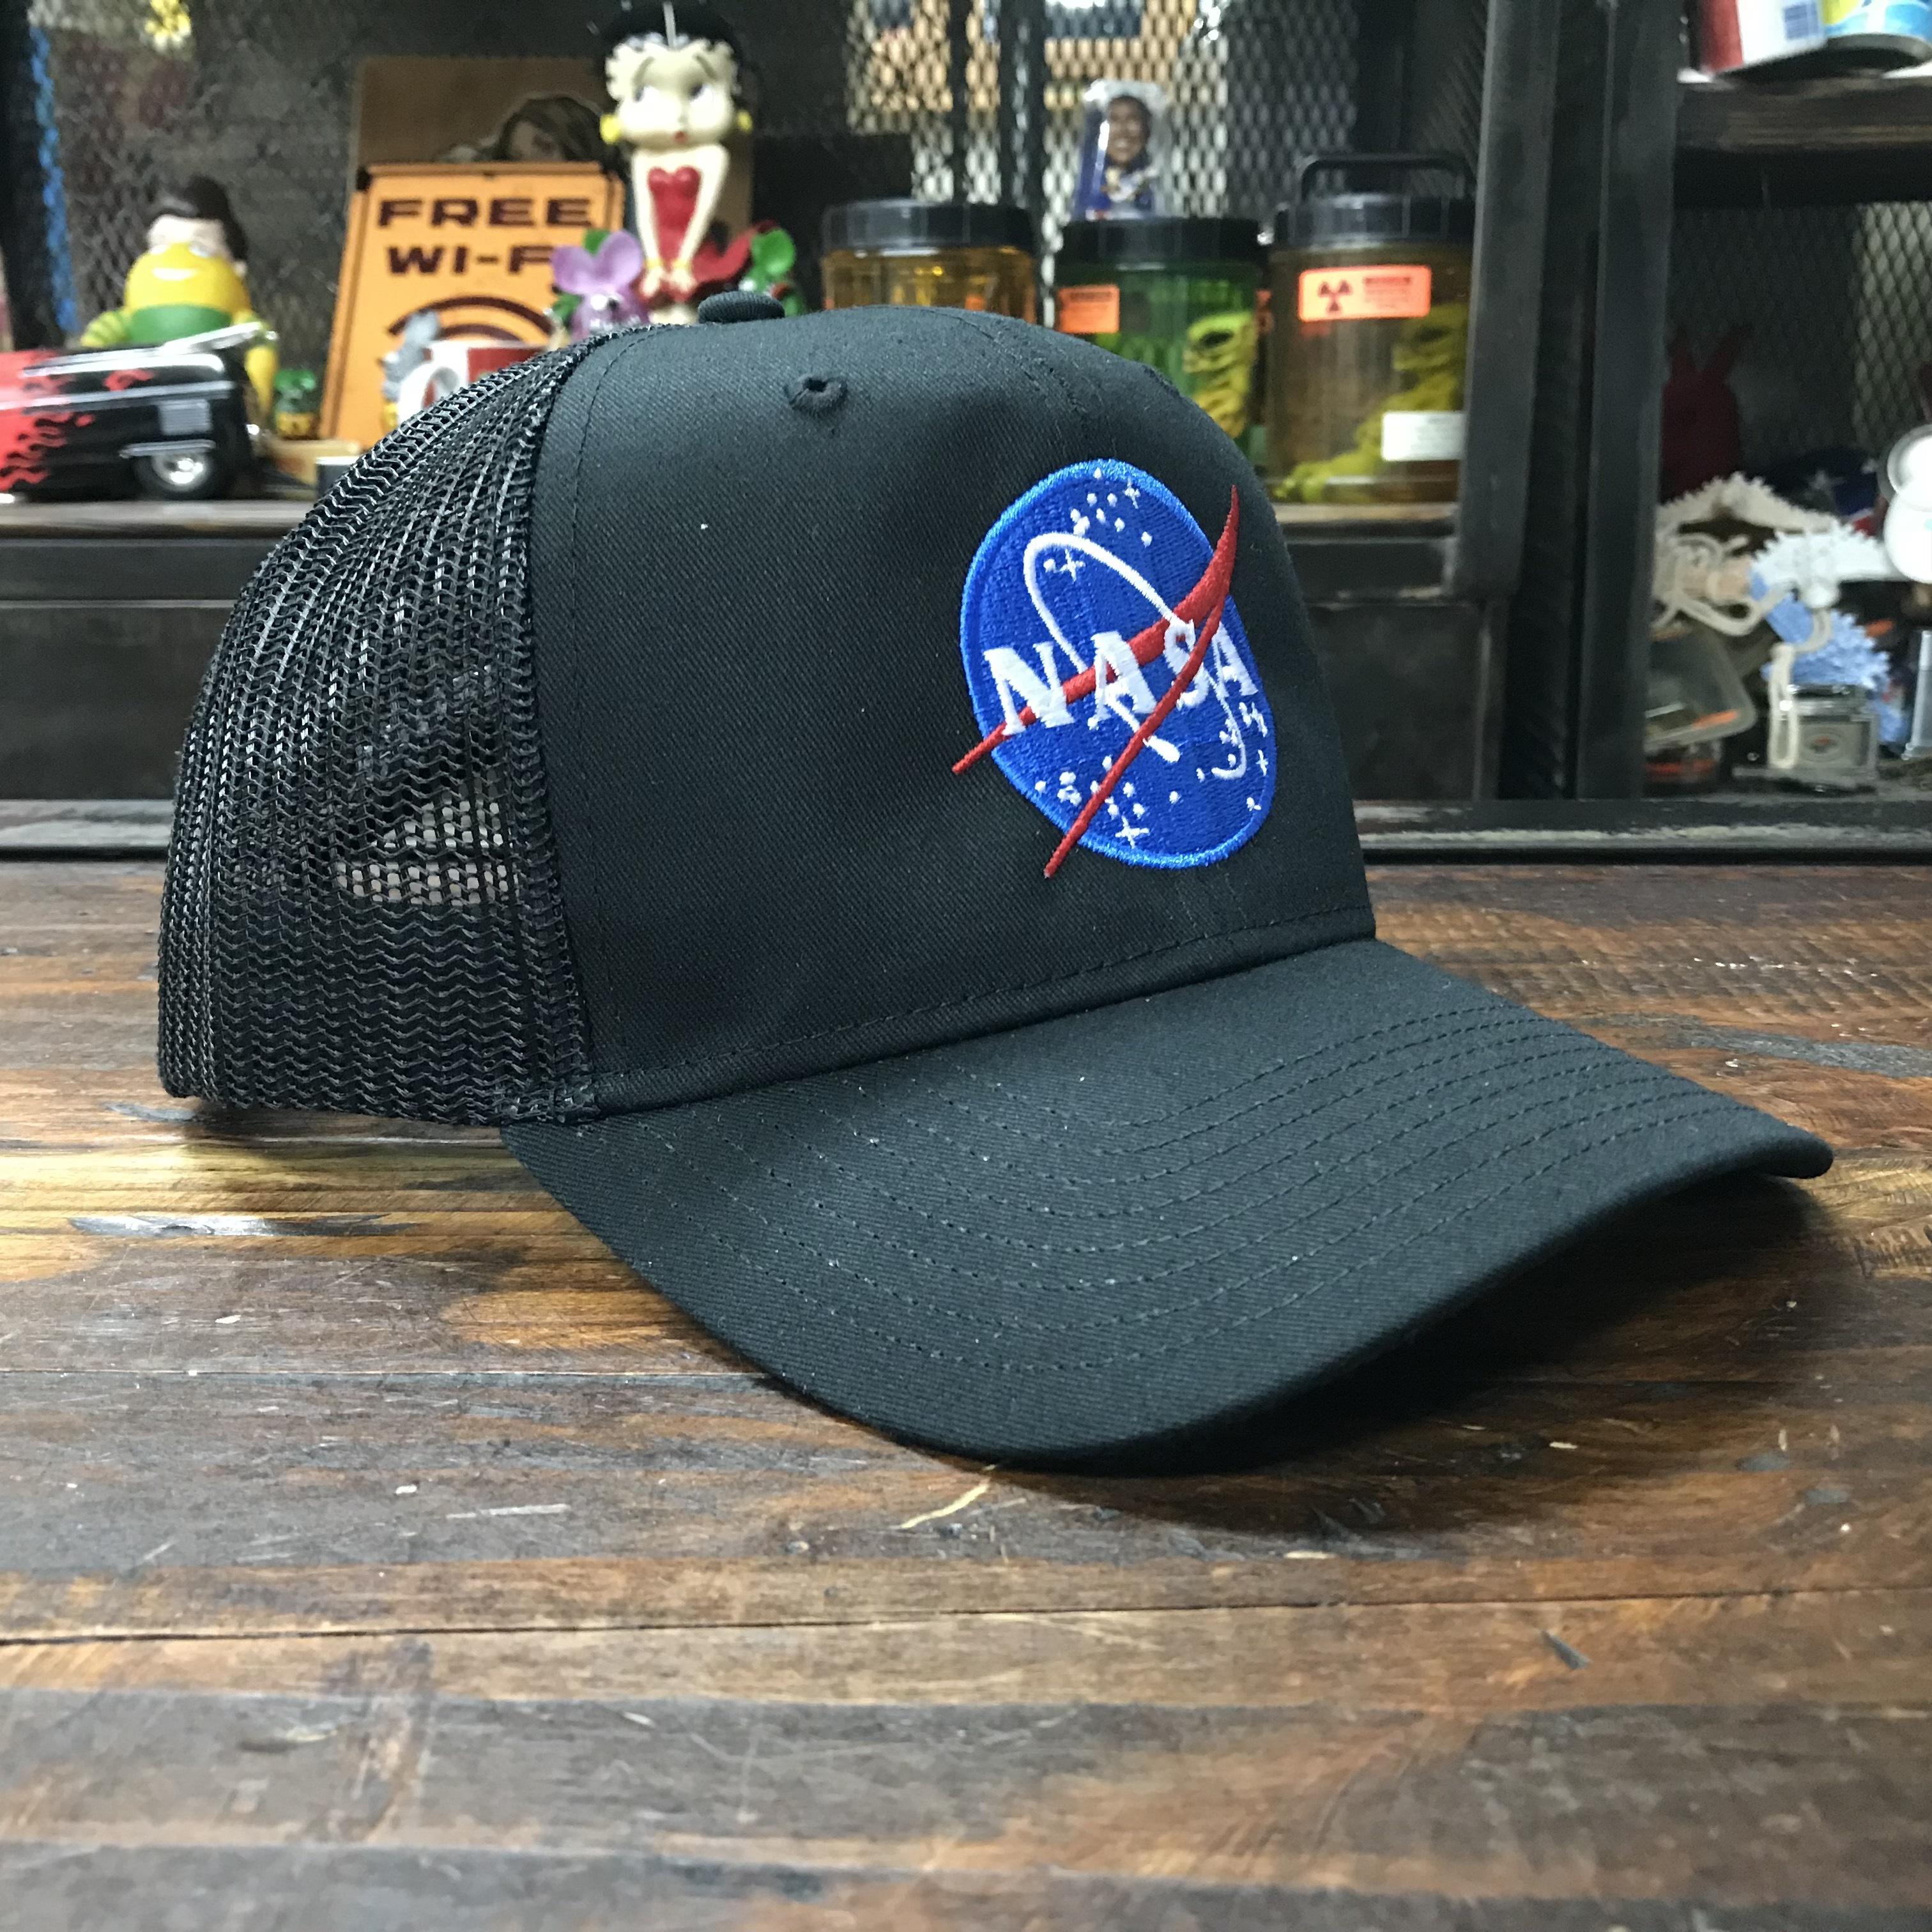 NASA OTTO(オットー)スナップバック・コットンメッシュキャップ・インサイニア(ミートボール)